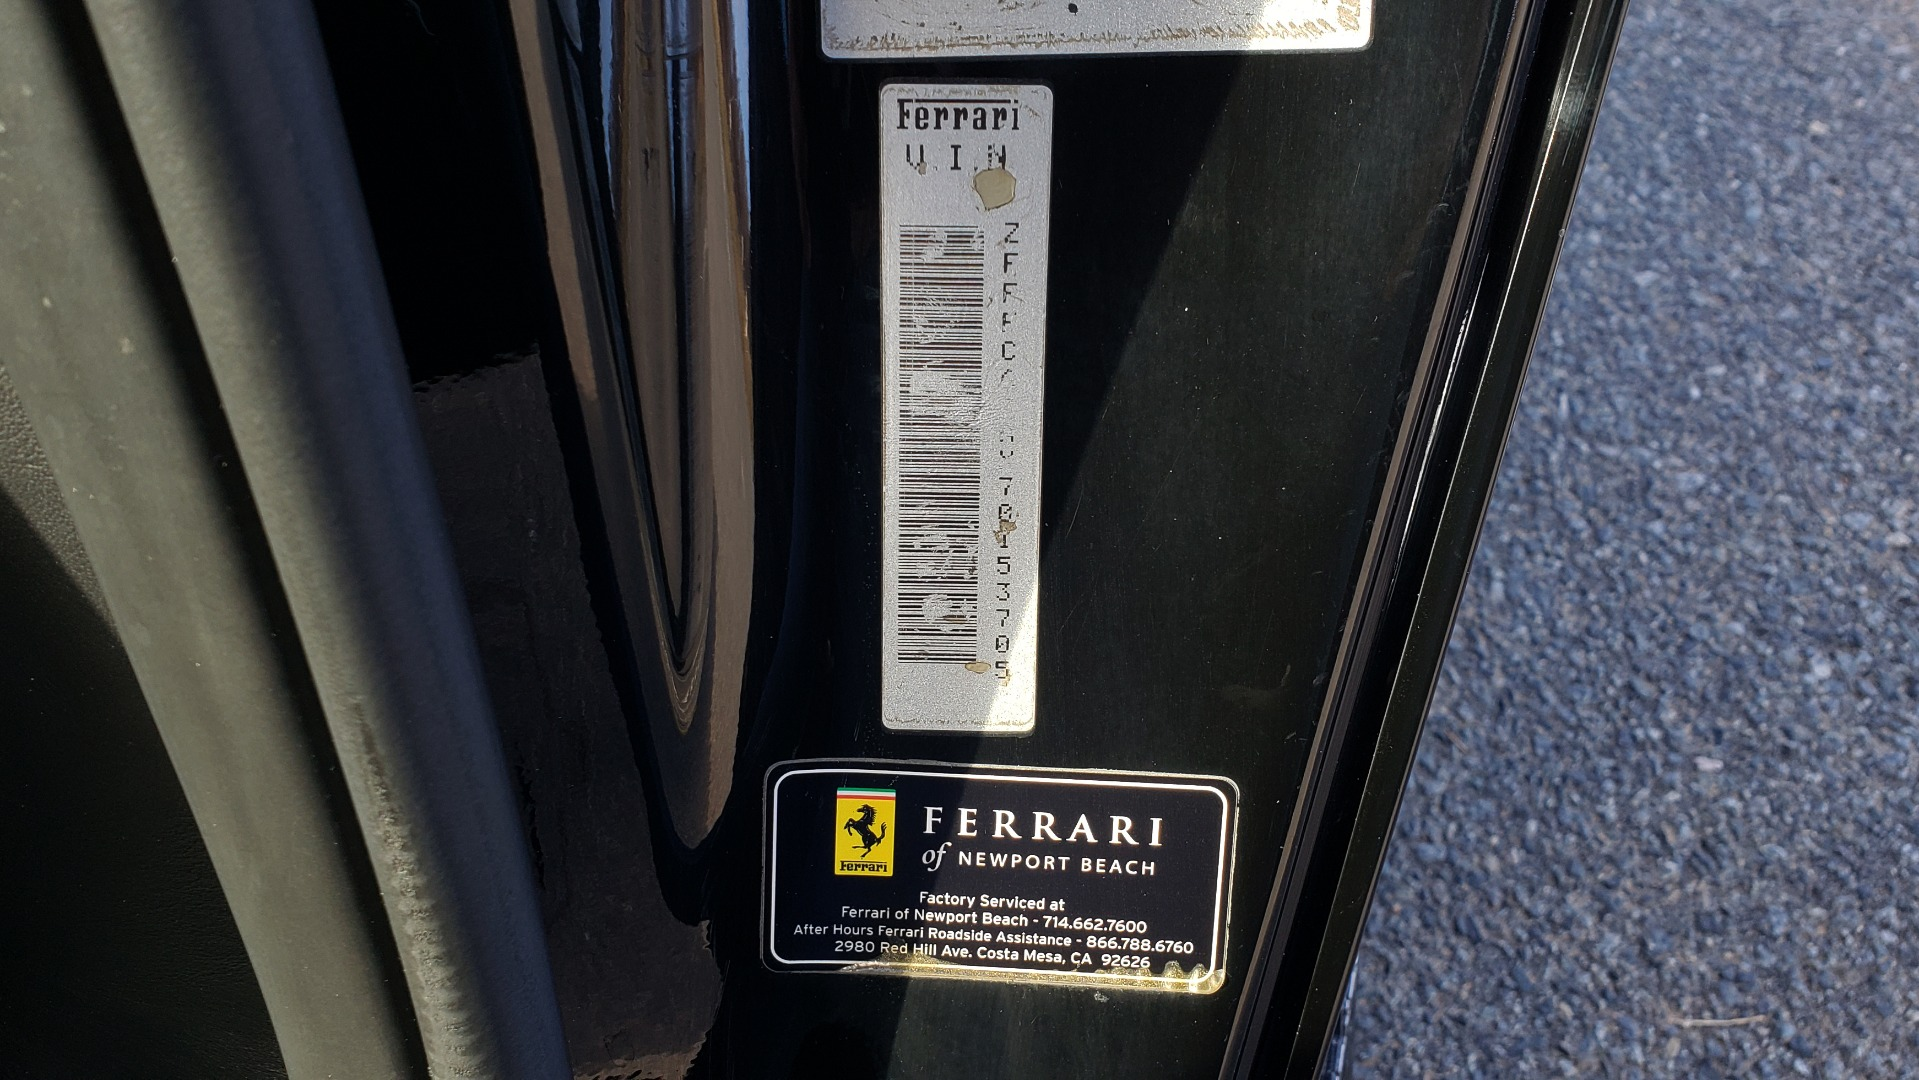 Used 2007 Ferrari 599 GTB FIORANO HGTE / V12 / F1 TRANS / NAV / BOSE / CUSTOM WHEELS for sale $109,999 at Formula Imports in Charlotte NC 28227 118